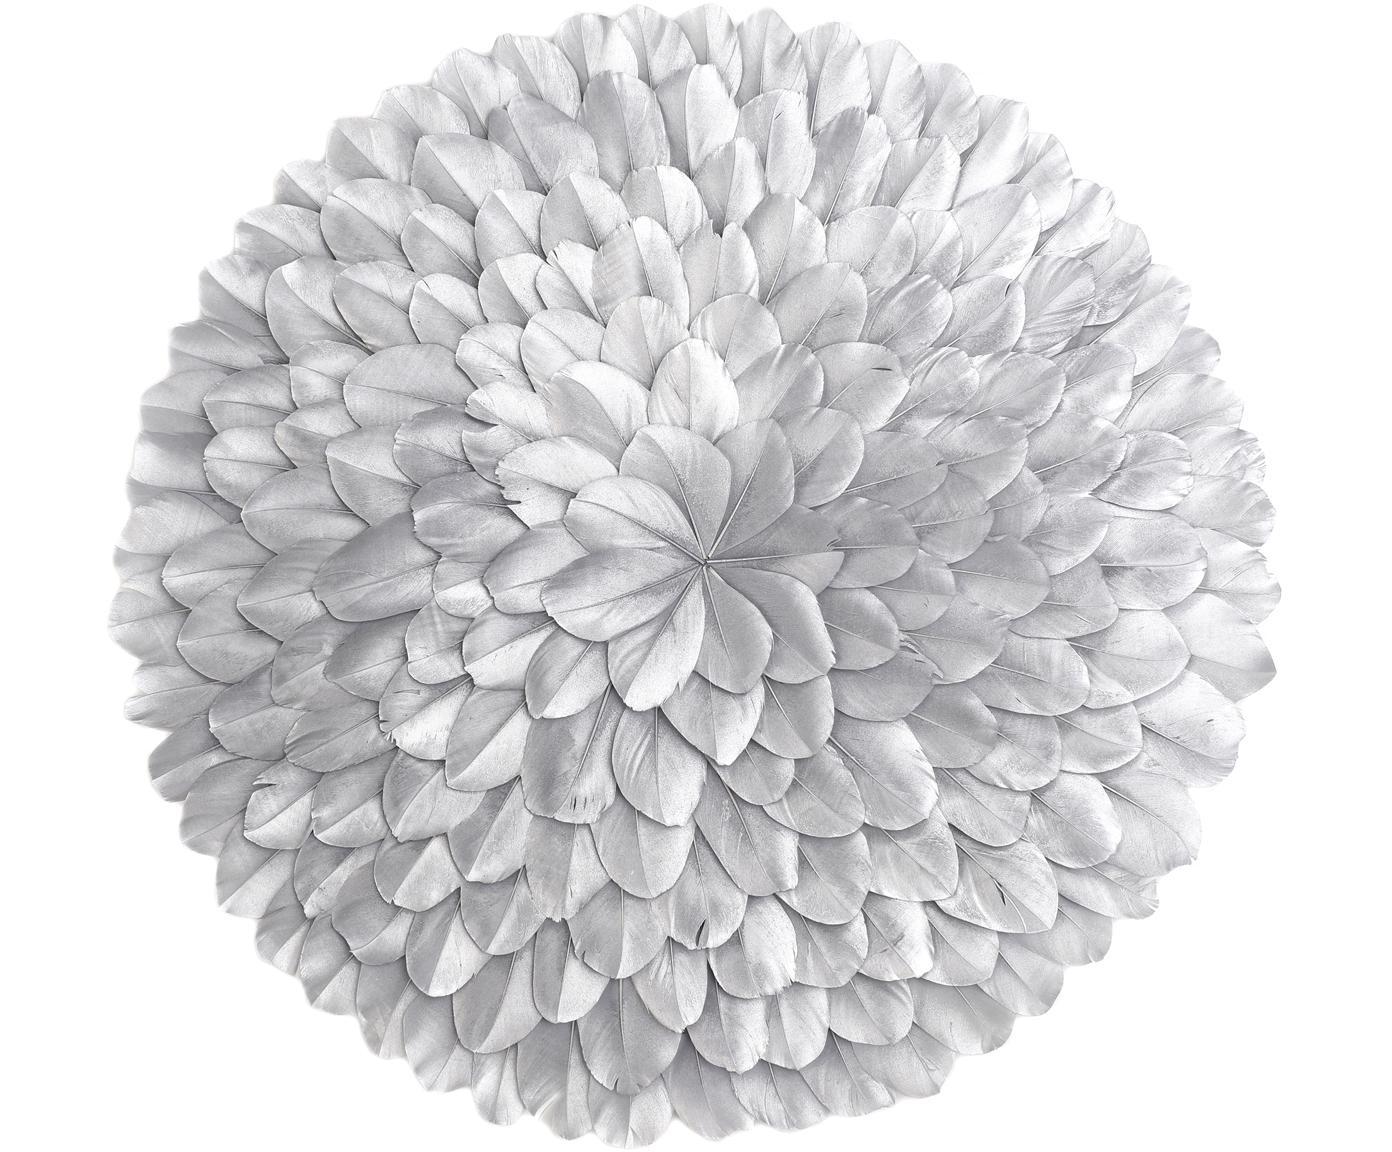 Wandobject Juju, Geverfde veren, Zilverkleurig, Ø 40 x D 5 cm